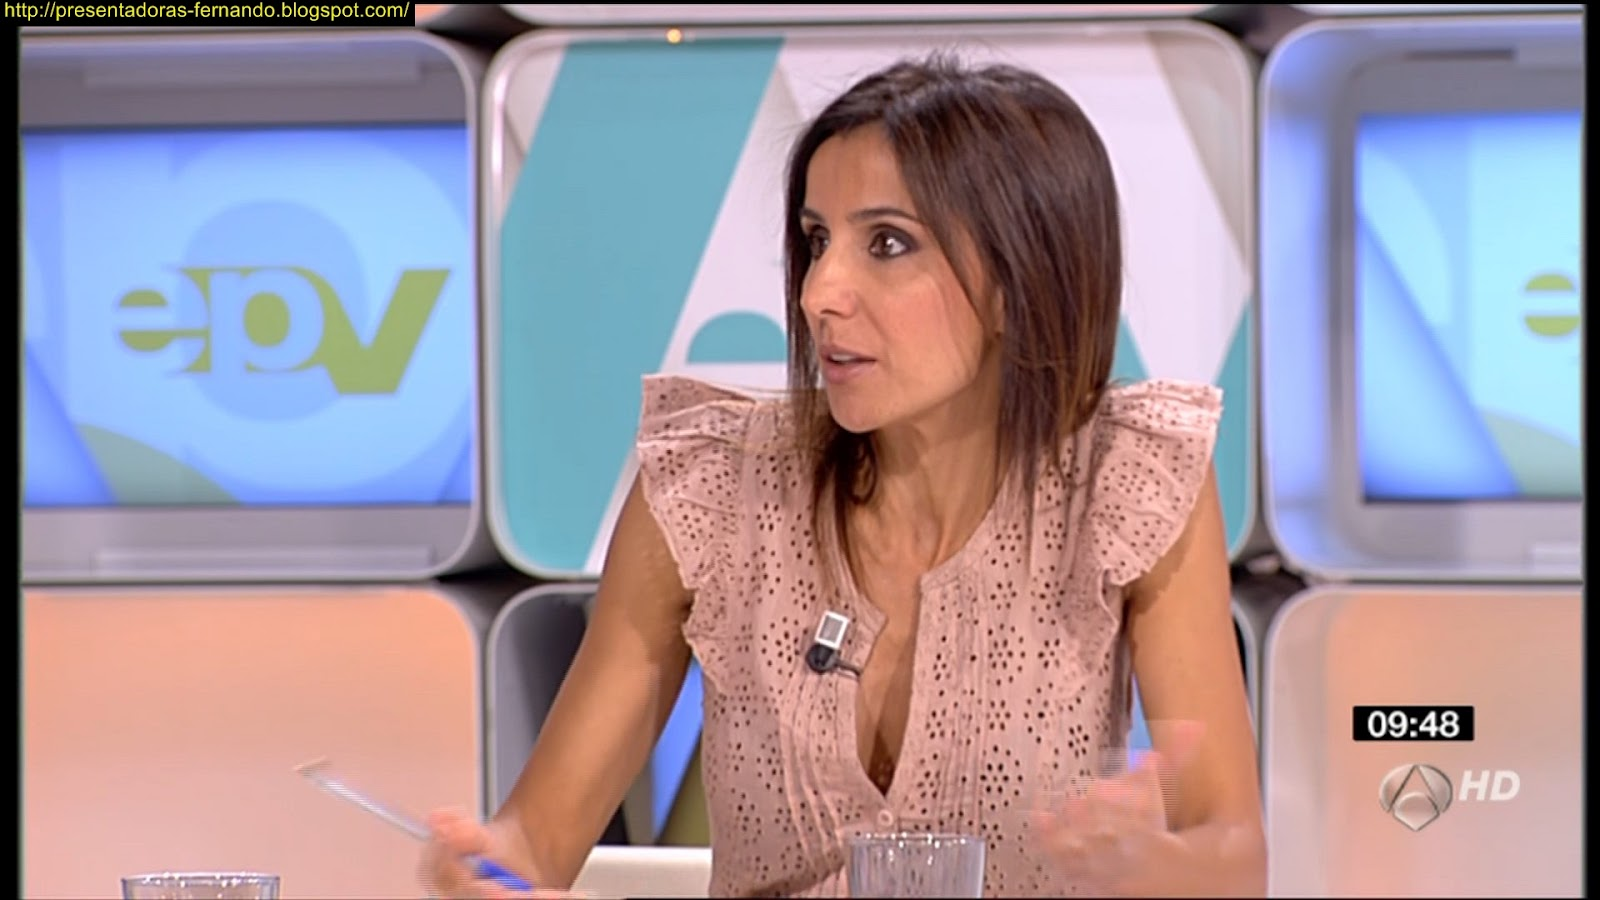 Presentadoras fernando carmen morodo espejo publico for Espejo publico verano